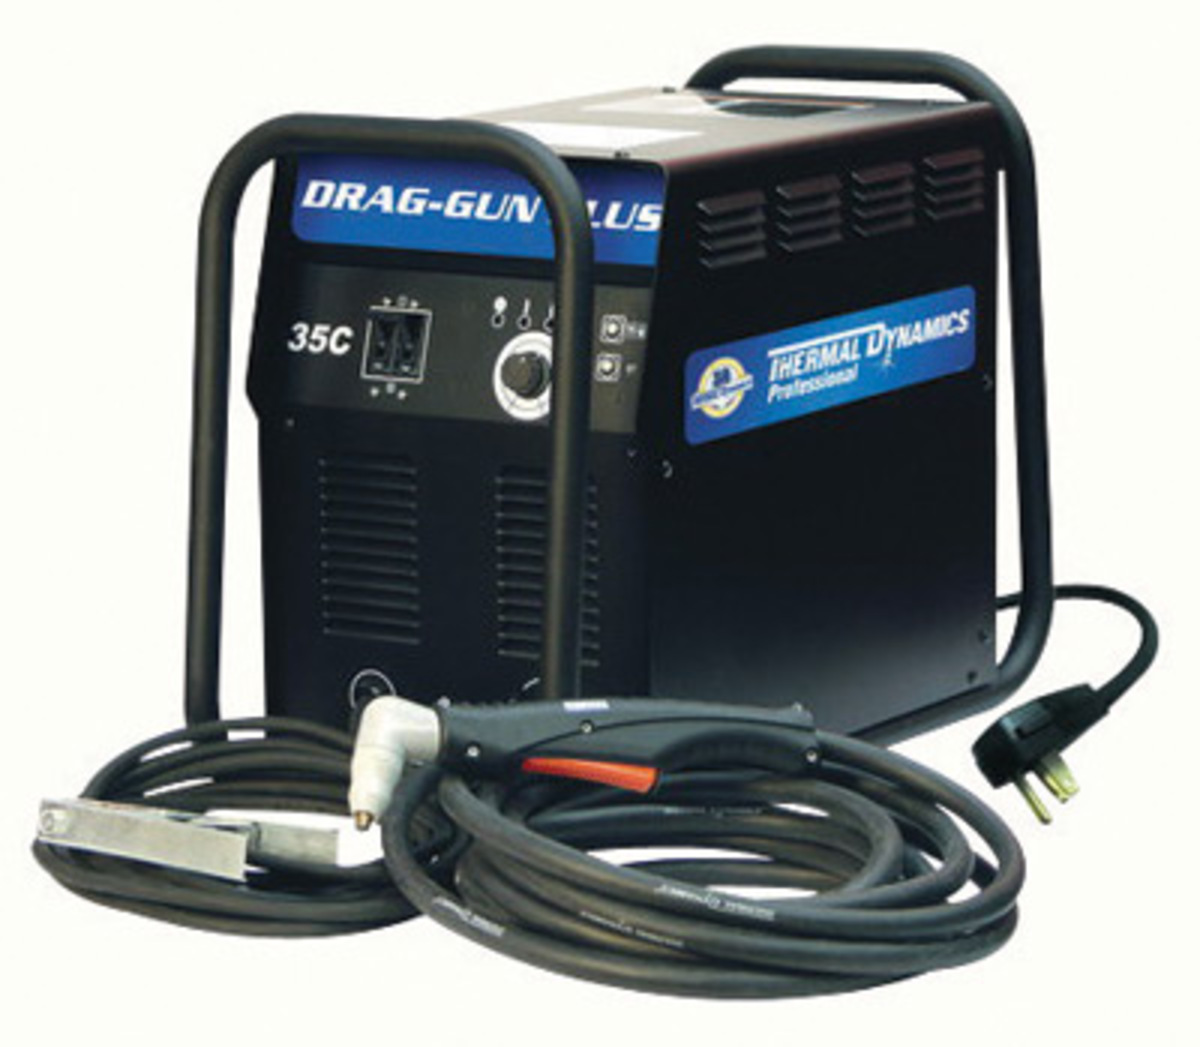 Airgas Tdc1 3835 1f Thermal Dynamics Drag Gun Plus Plasma